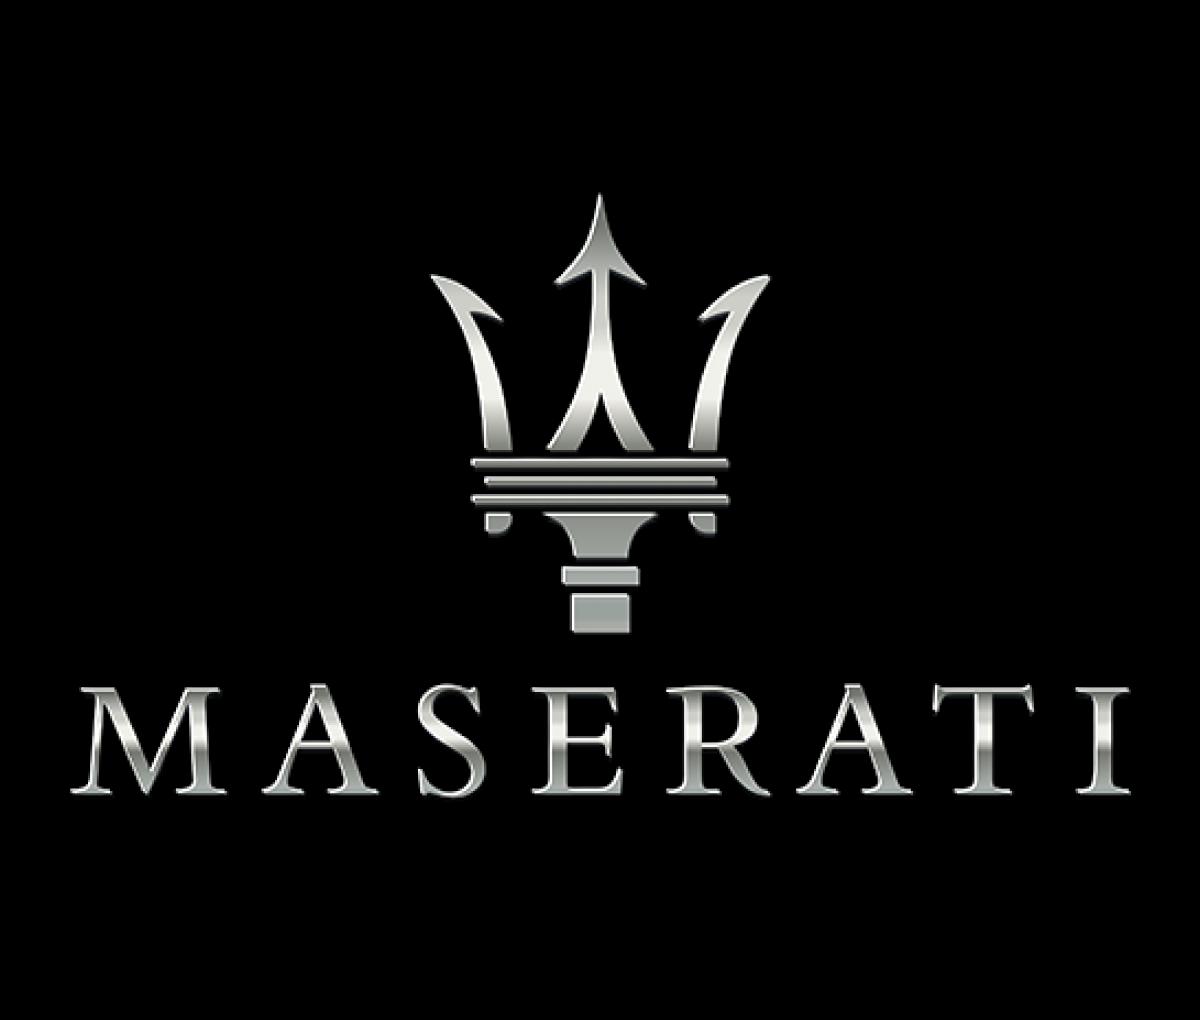 - Maserati